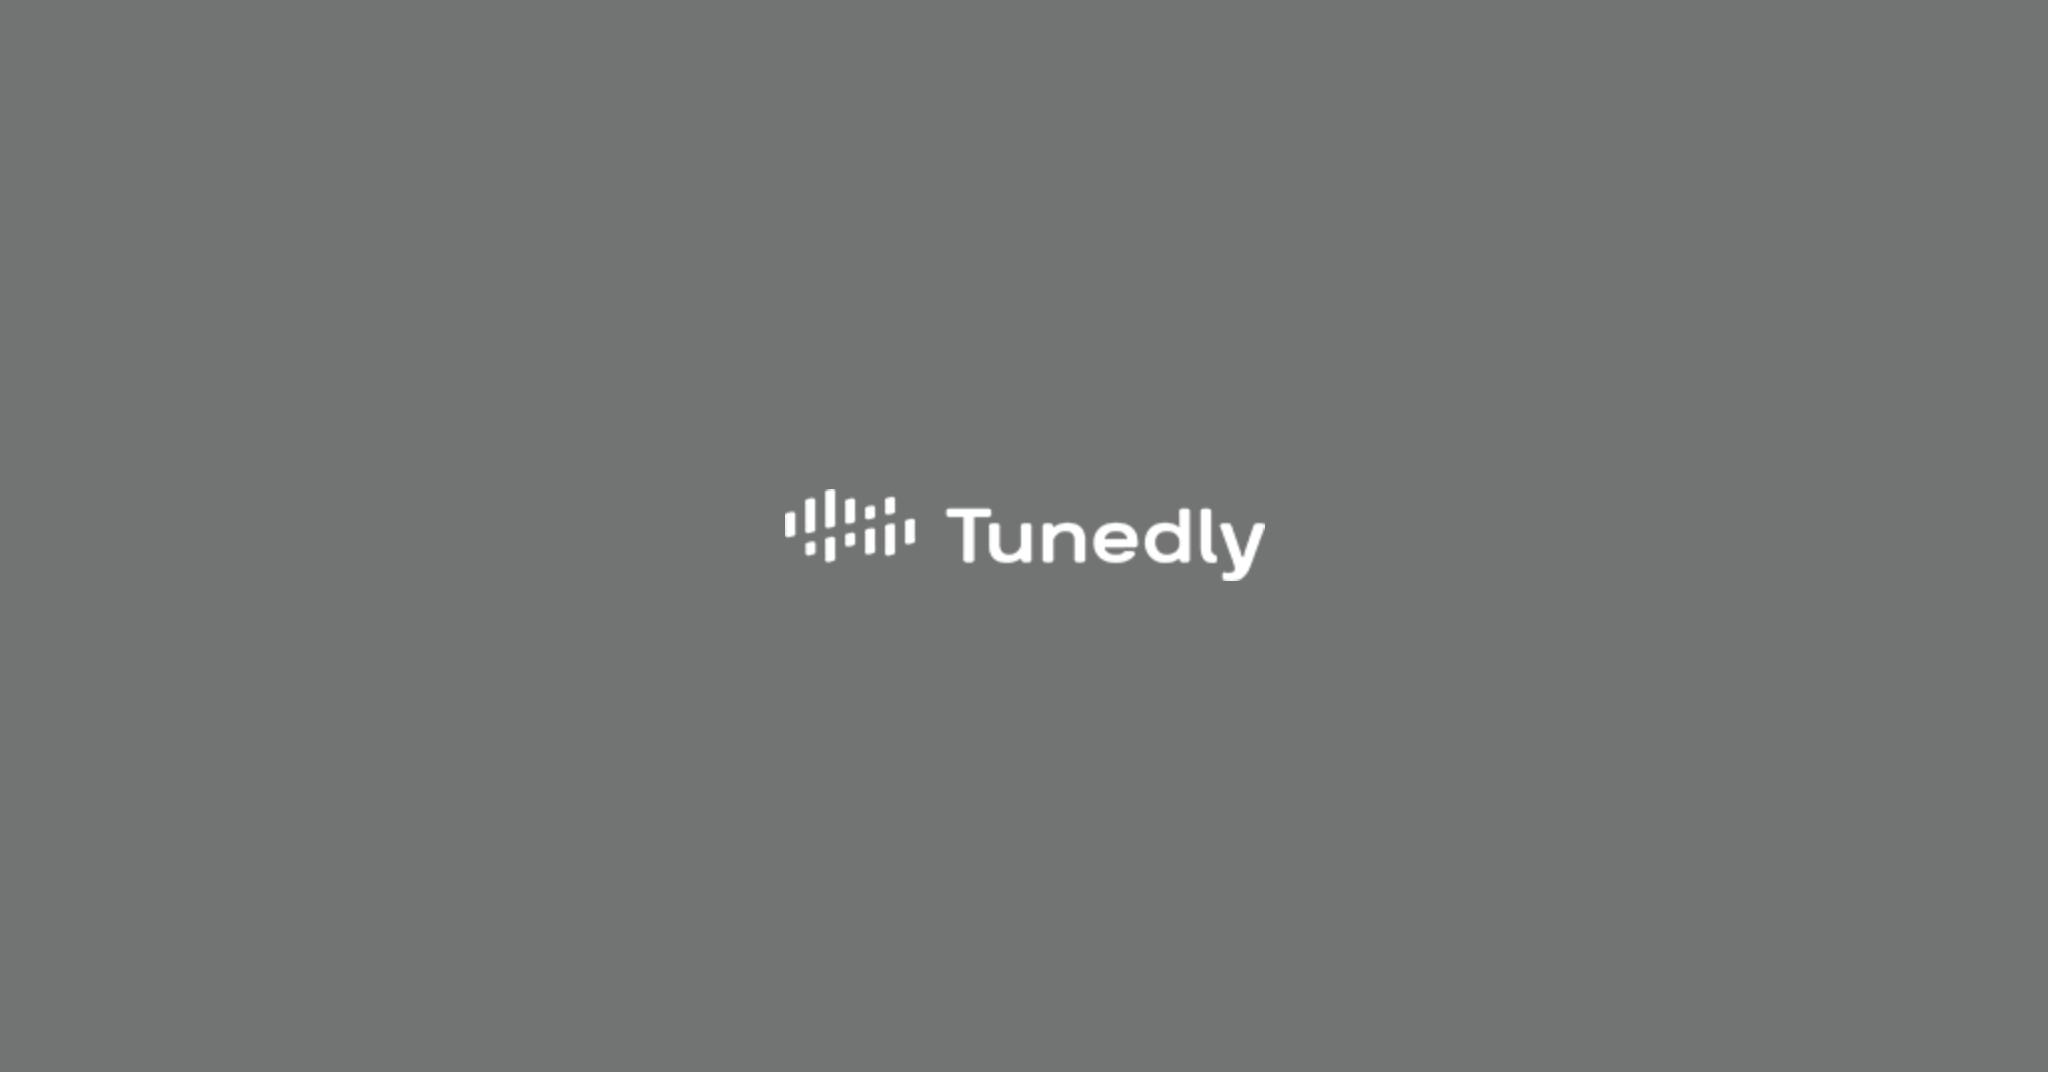 Tunedly